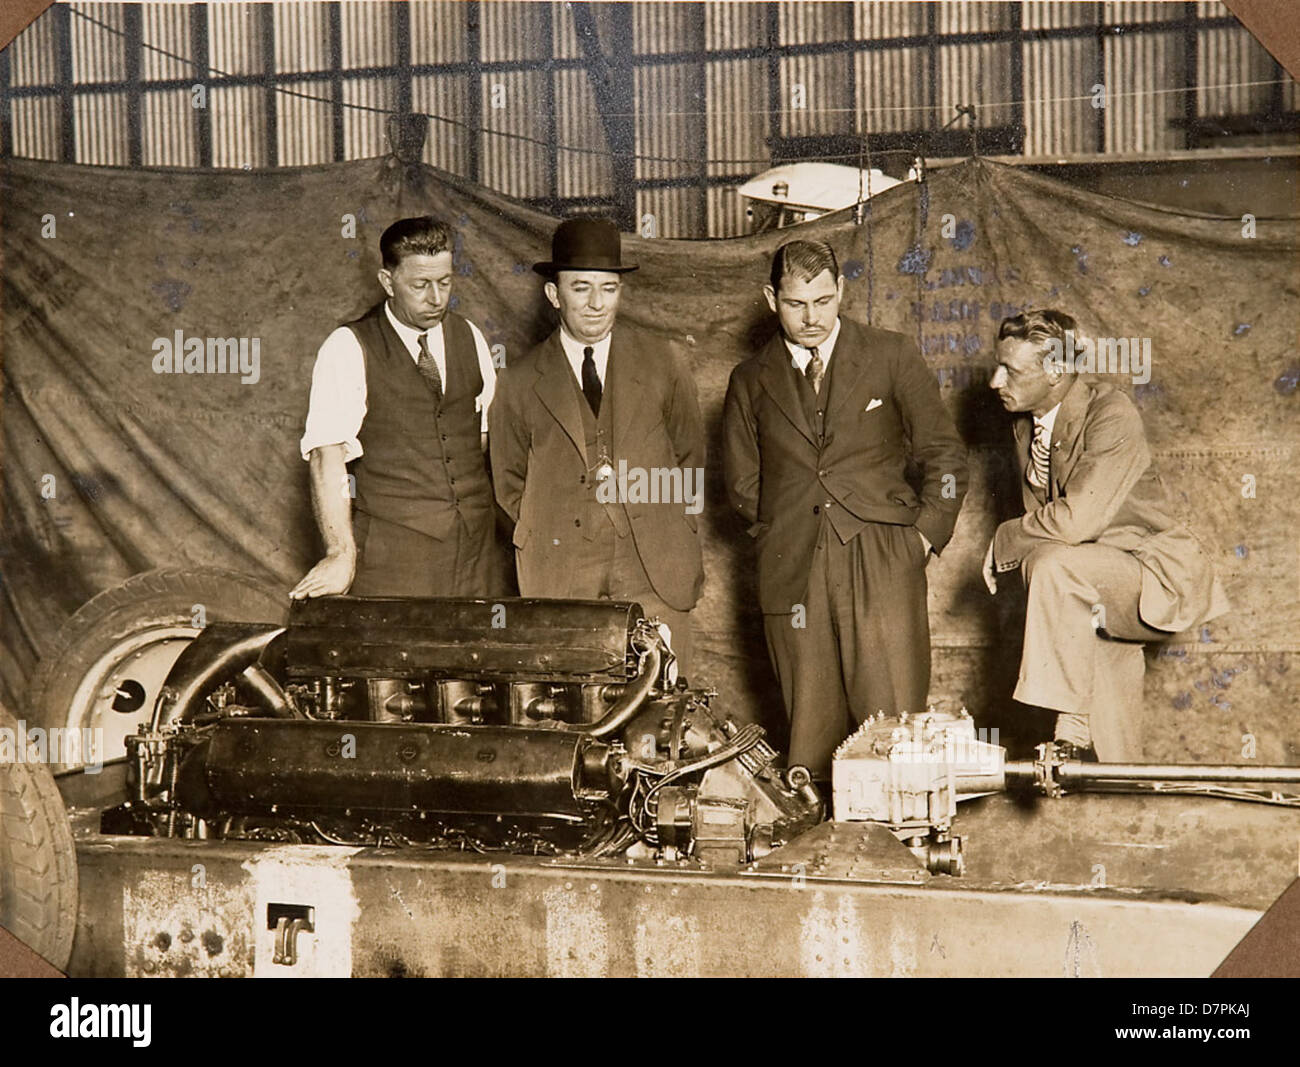 Group inspecting the car 'F.H. Stewart Enterprise' - Stock Image